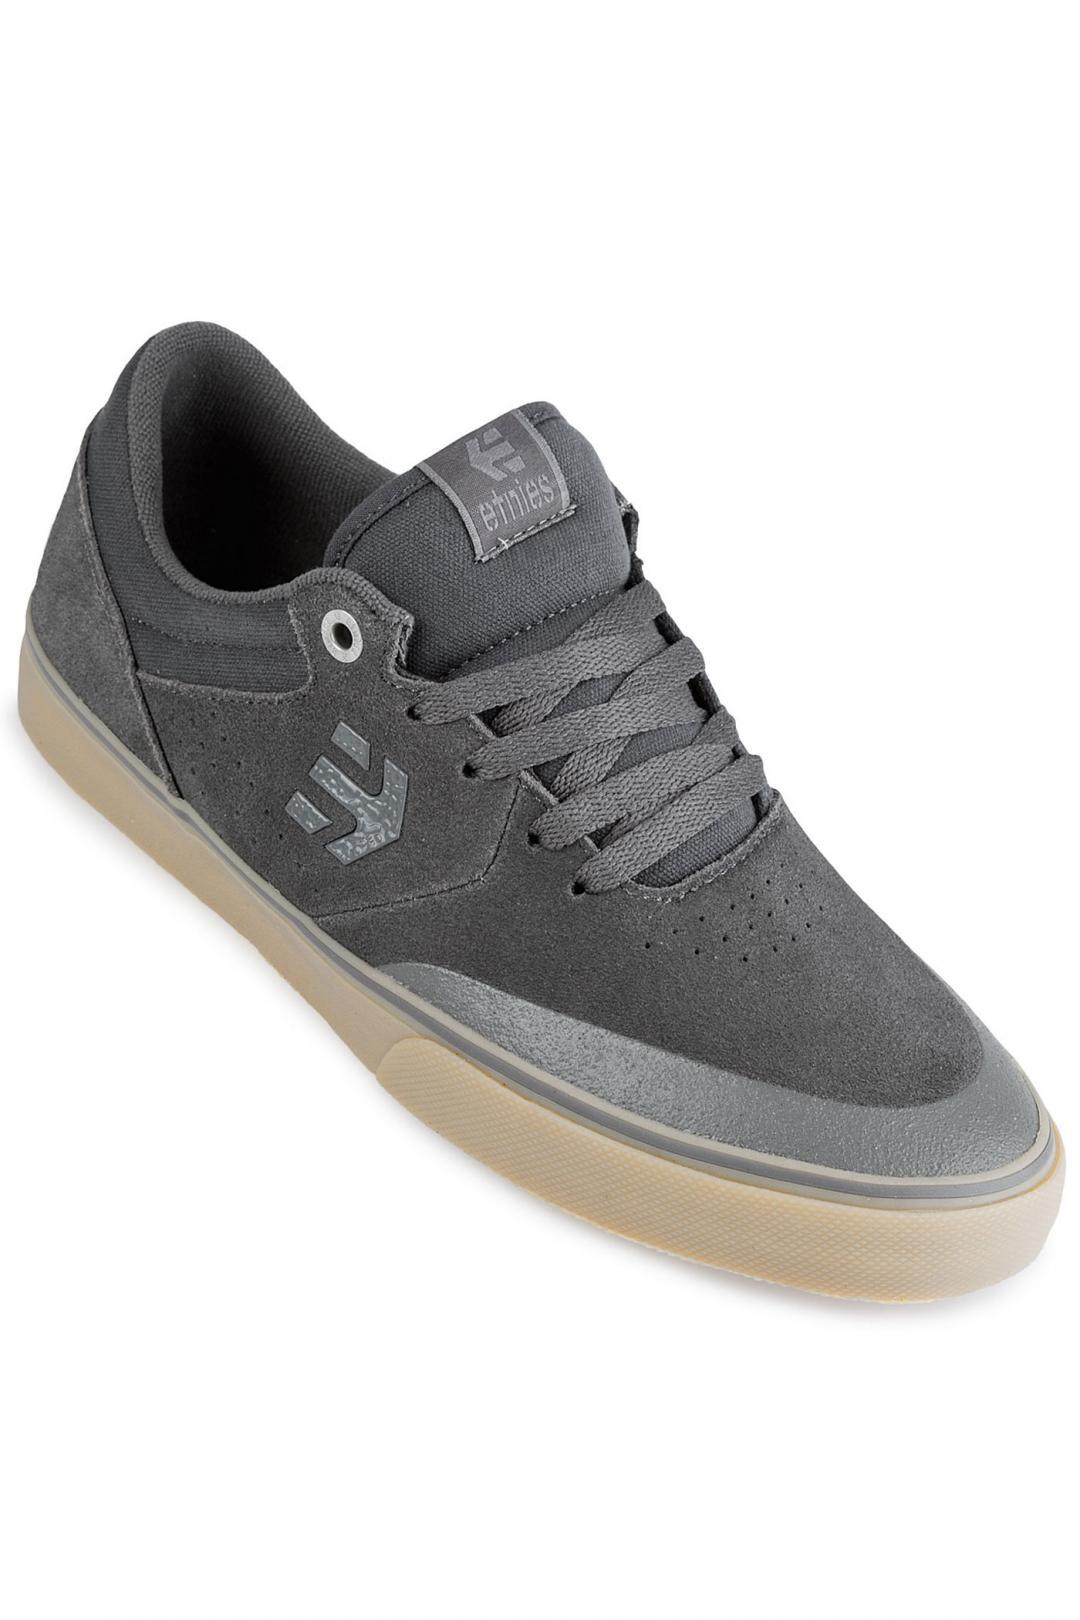 Uomo Etnies Marana Vulc grey gum | Sneaker